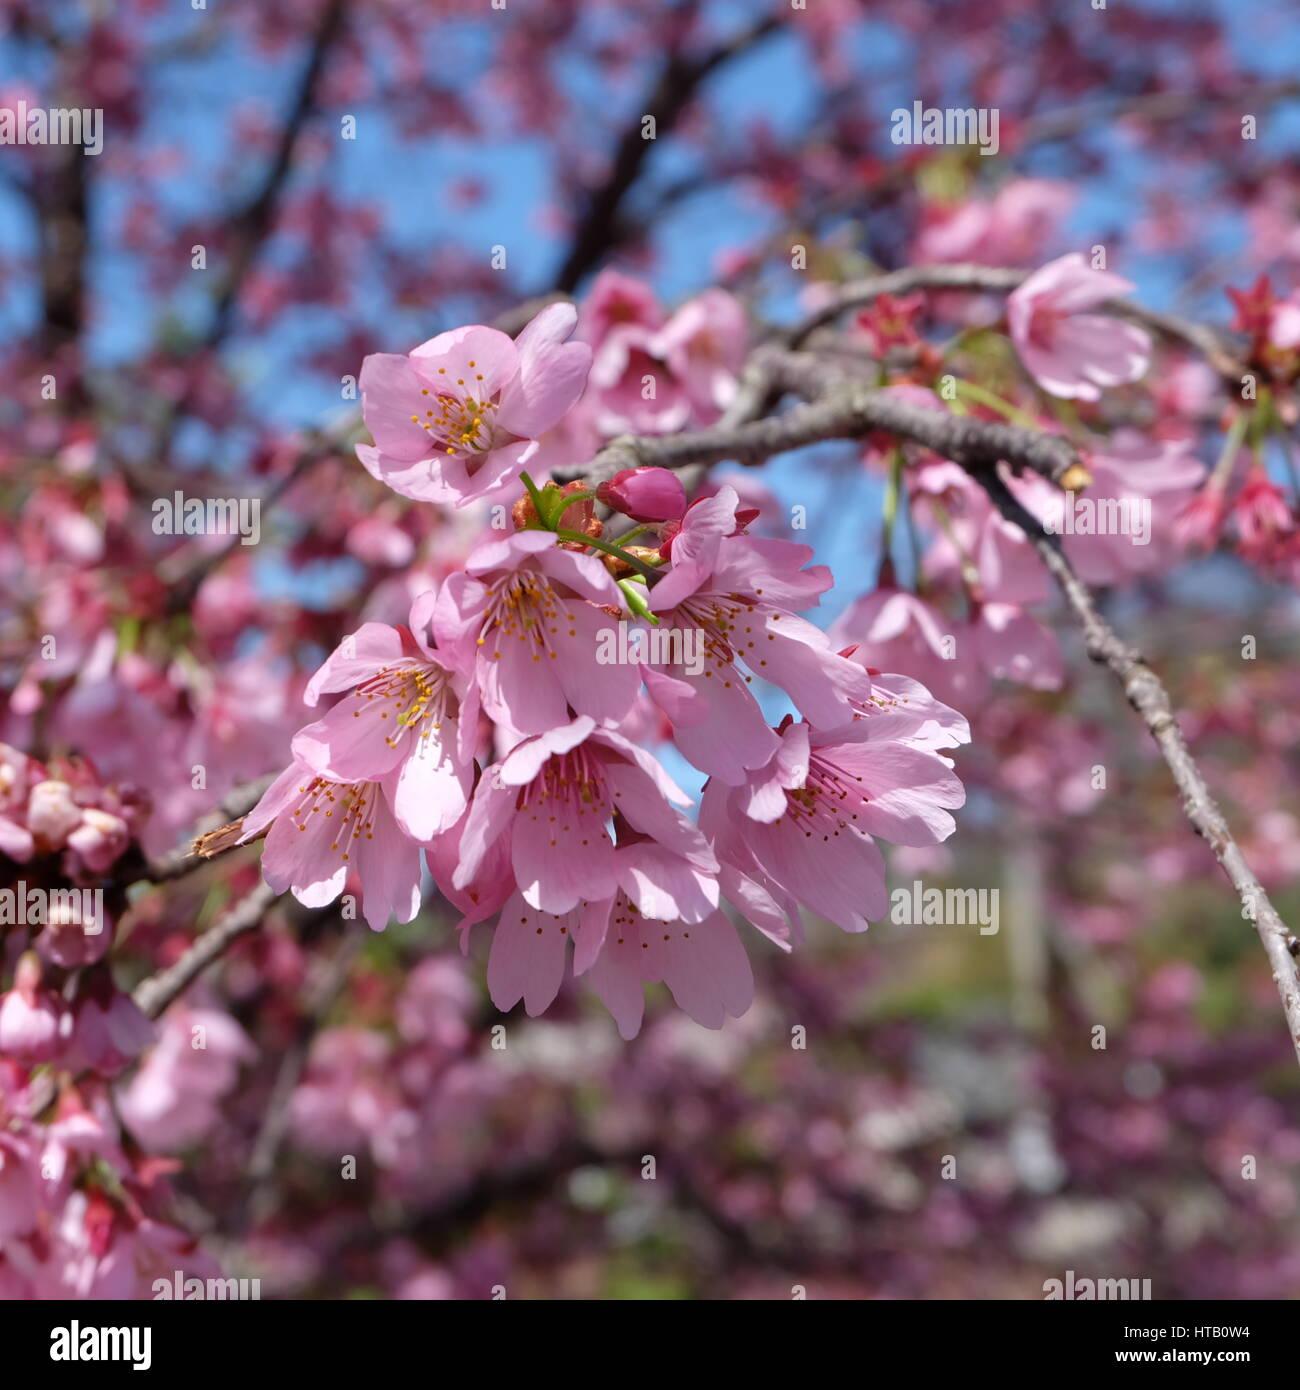 Beautiful pink cherry blossom sakura flower blooming in spring beautiful pink cherry blossom sakura flower blooming in spring around march or april in japan mightylinksfo